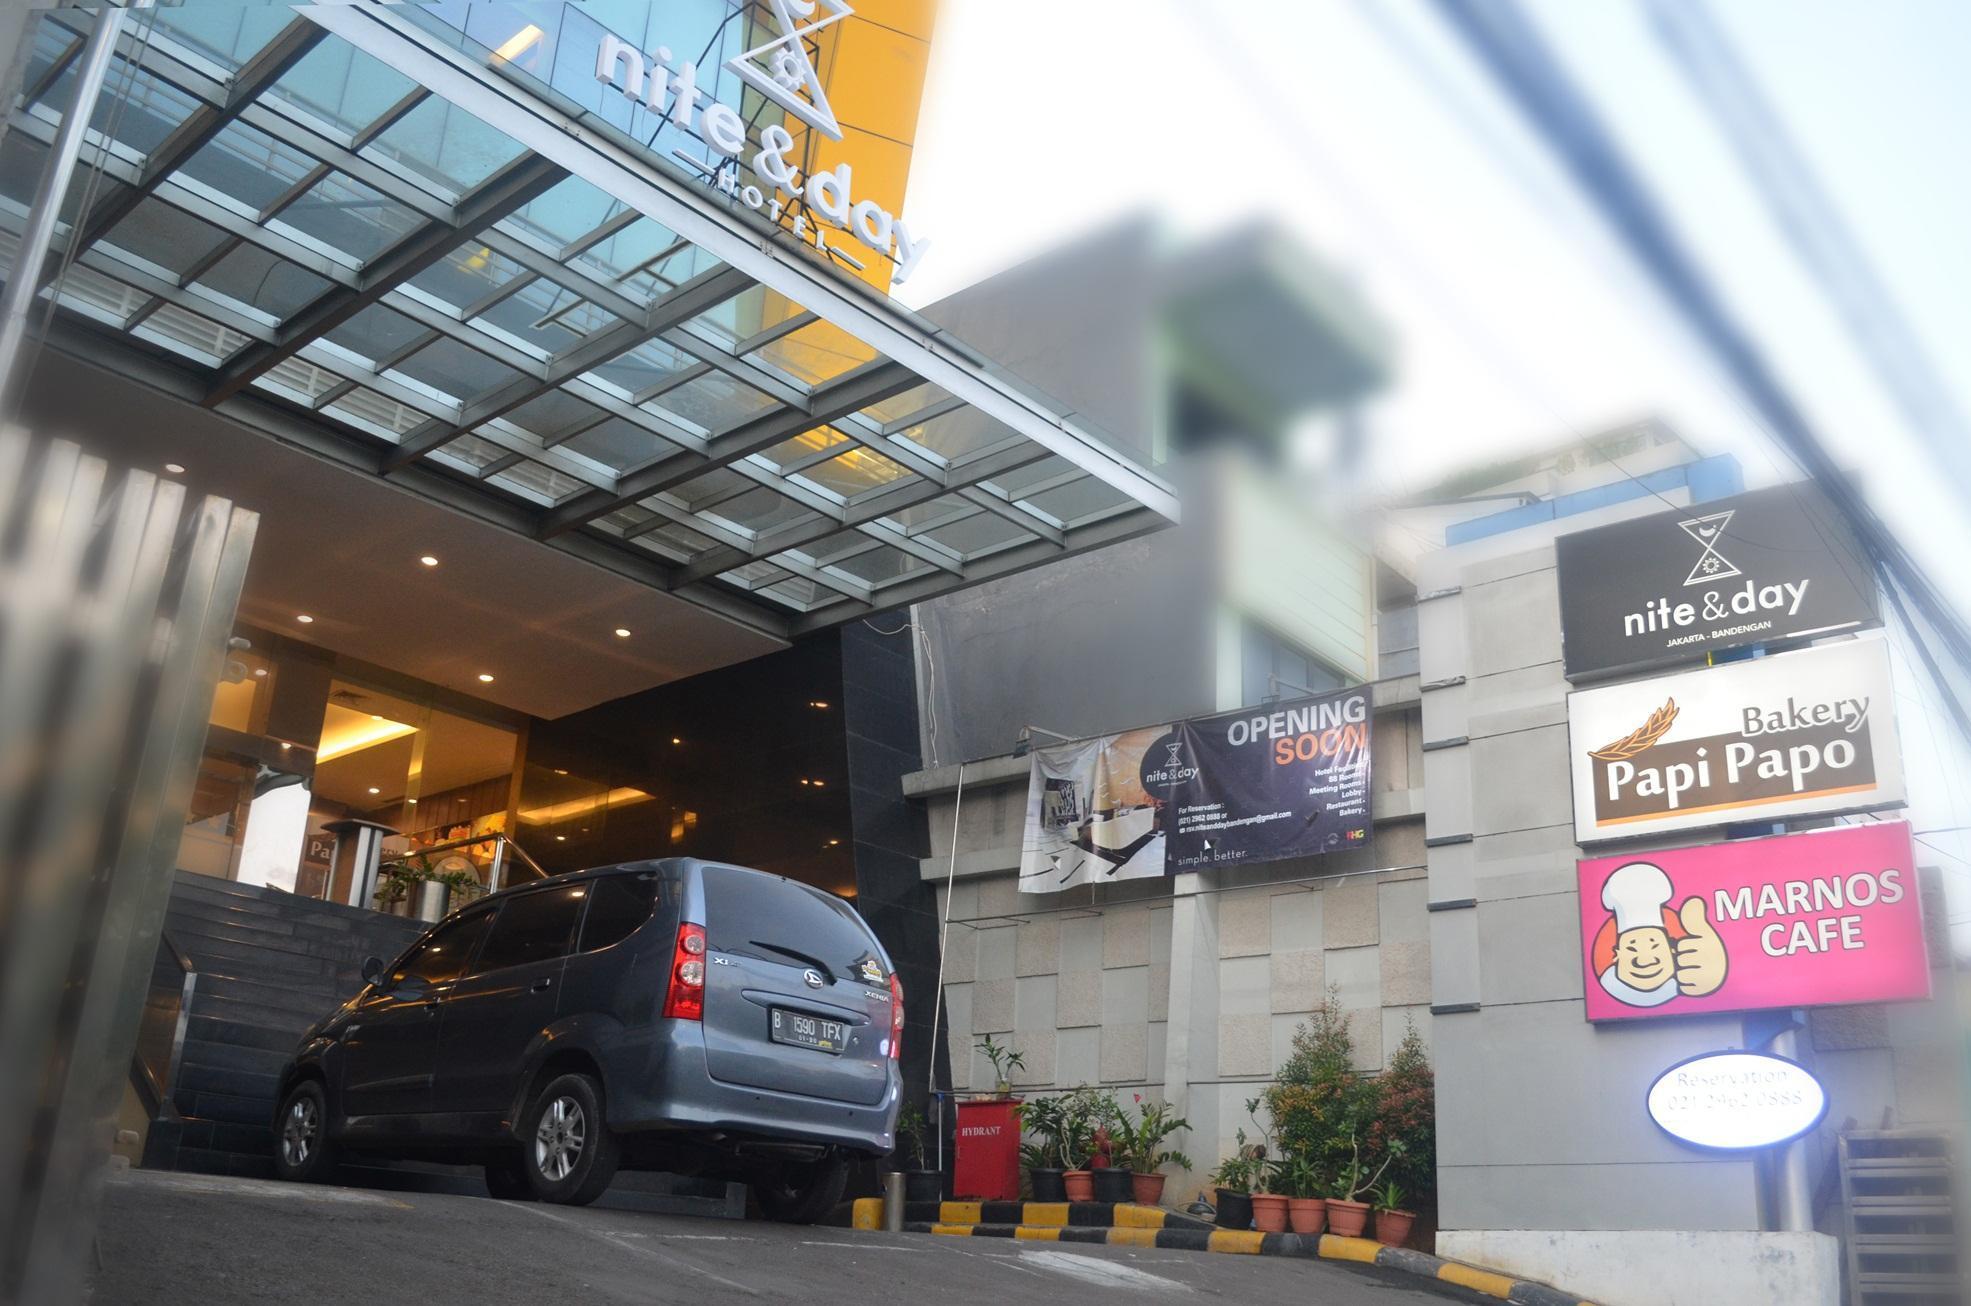 Nite And Day Jakarta   Bandengan